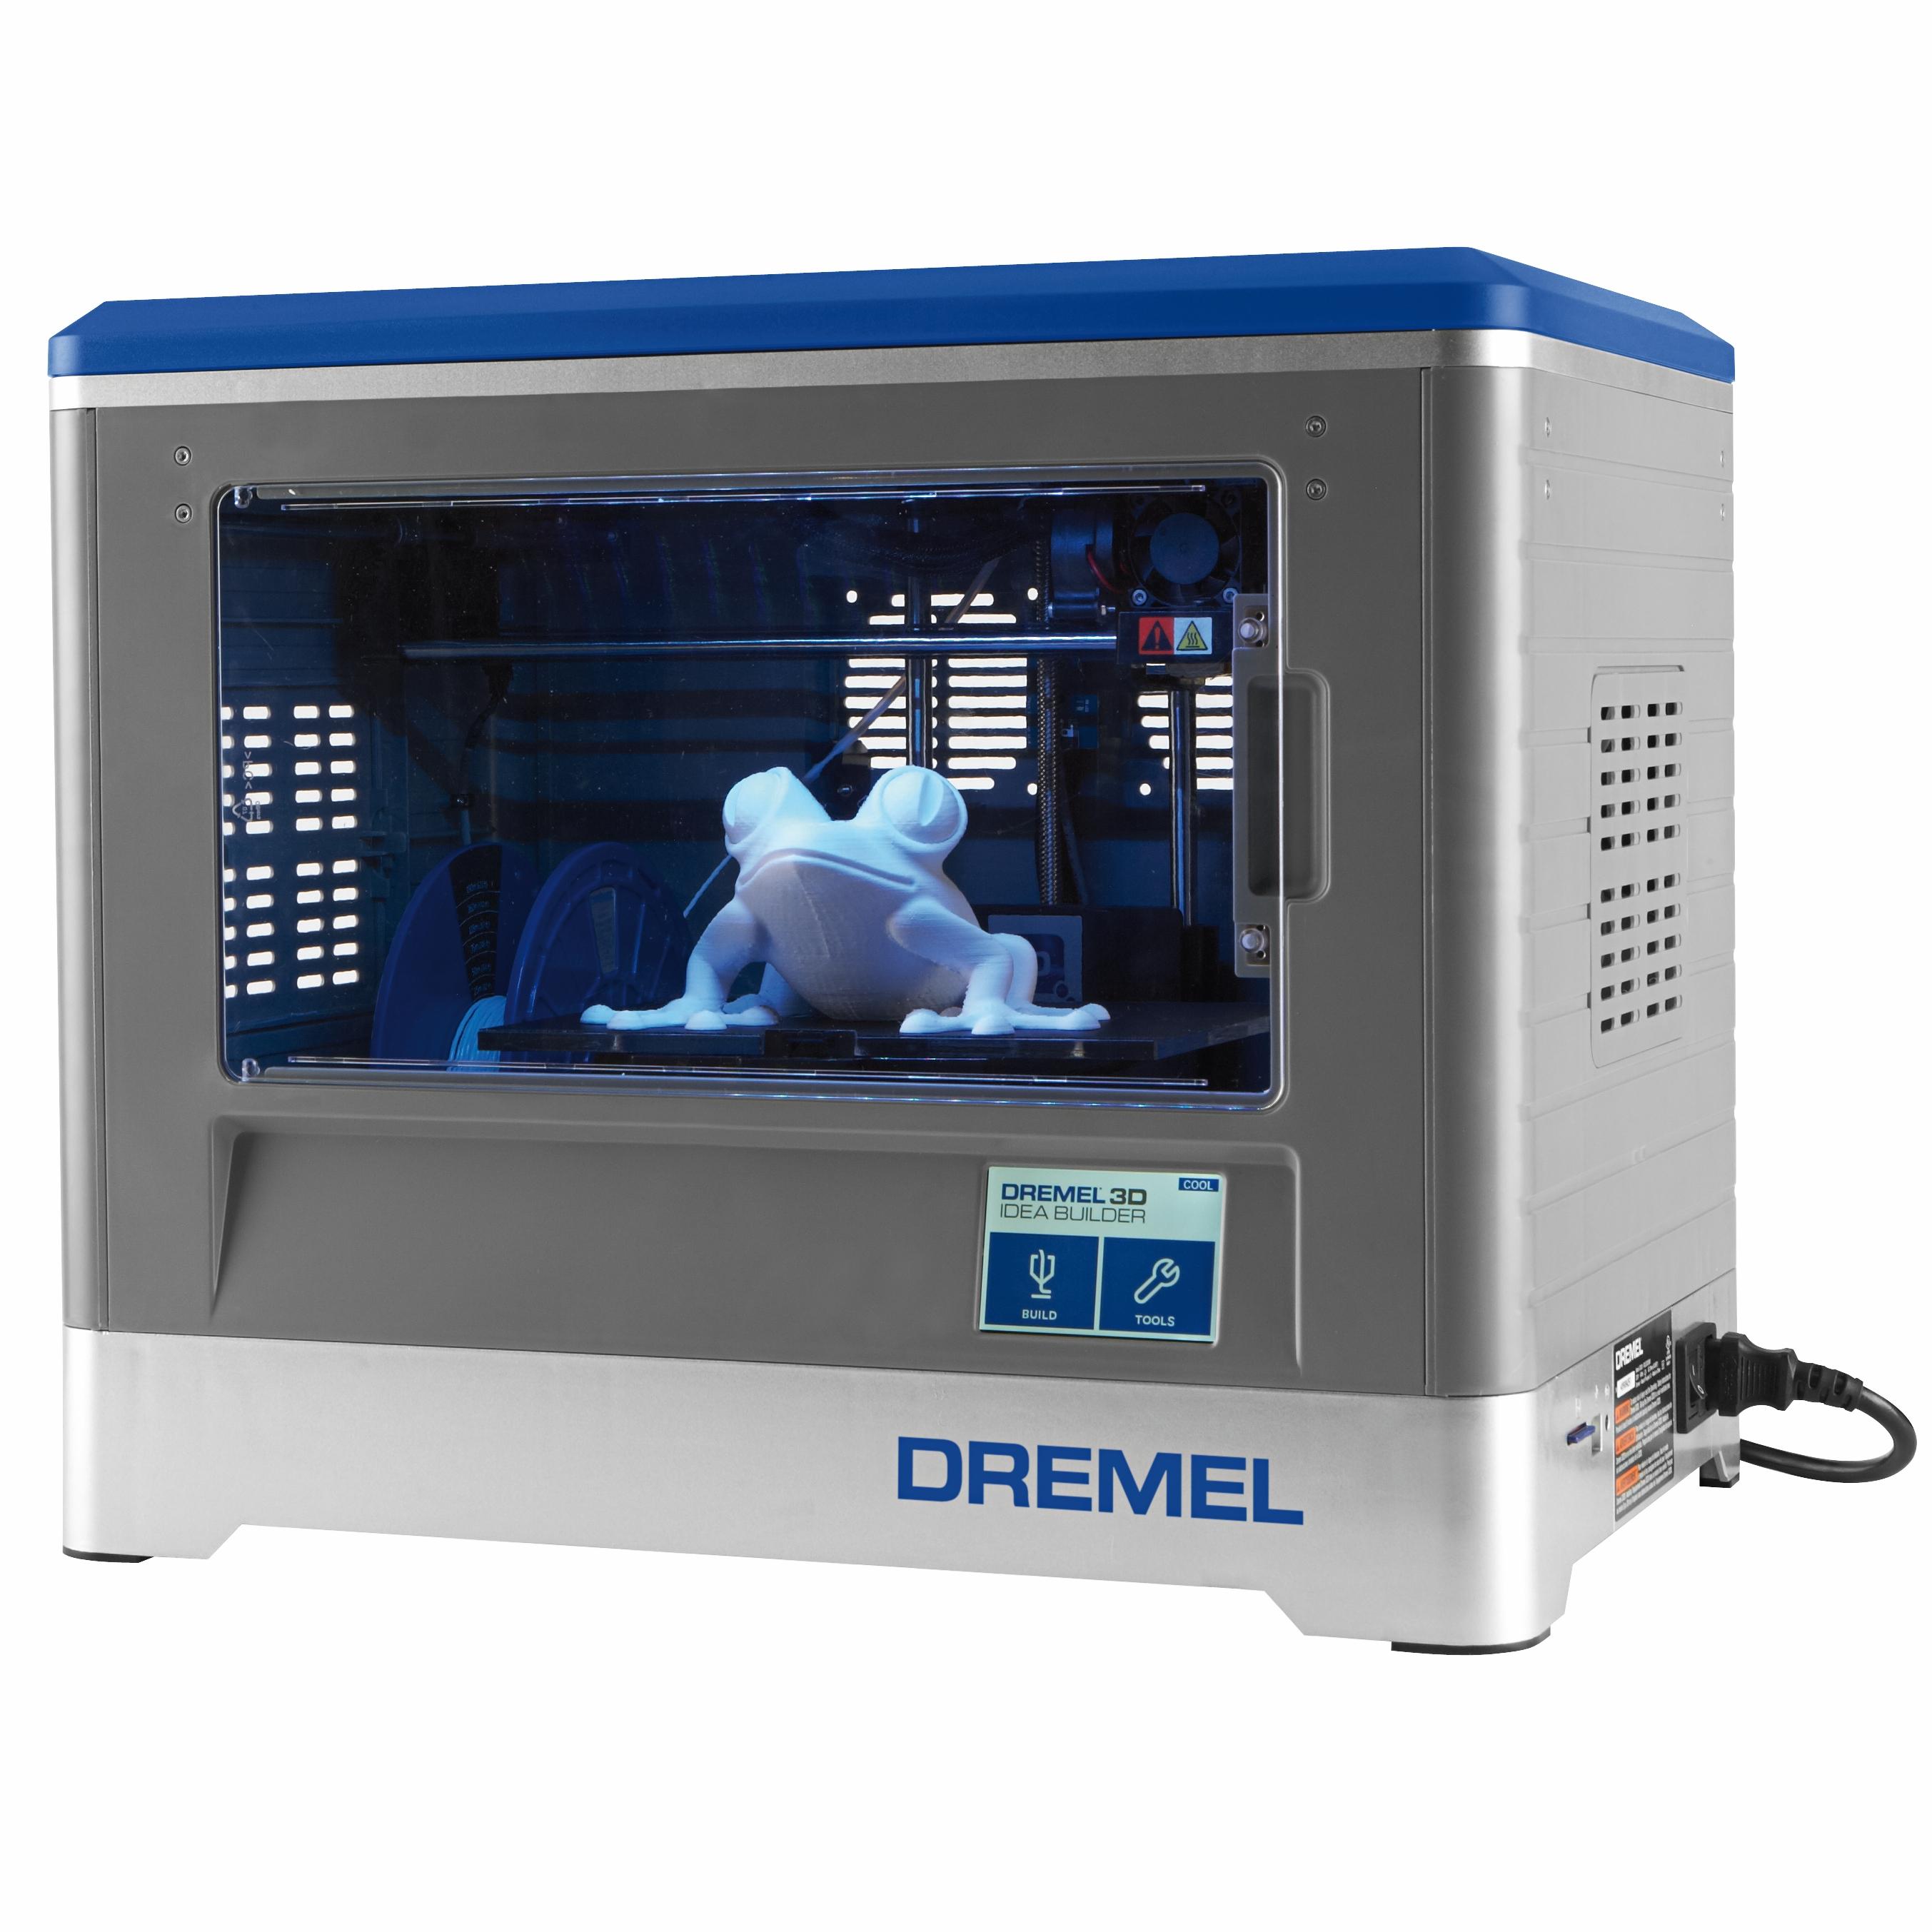 Factory Reconditioned Digilab 3D20 Idea Builder 3D Printer - Home Depot - $349